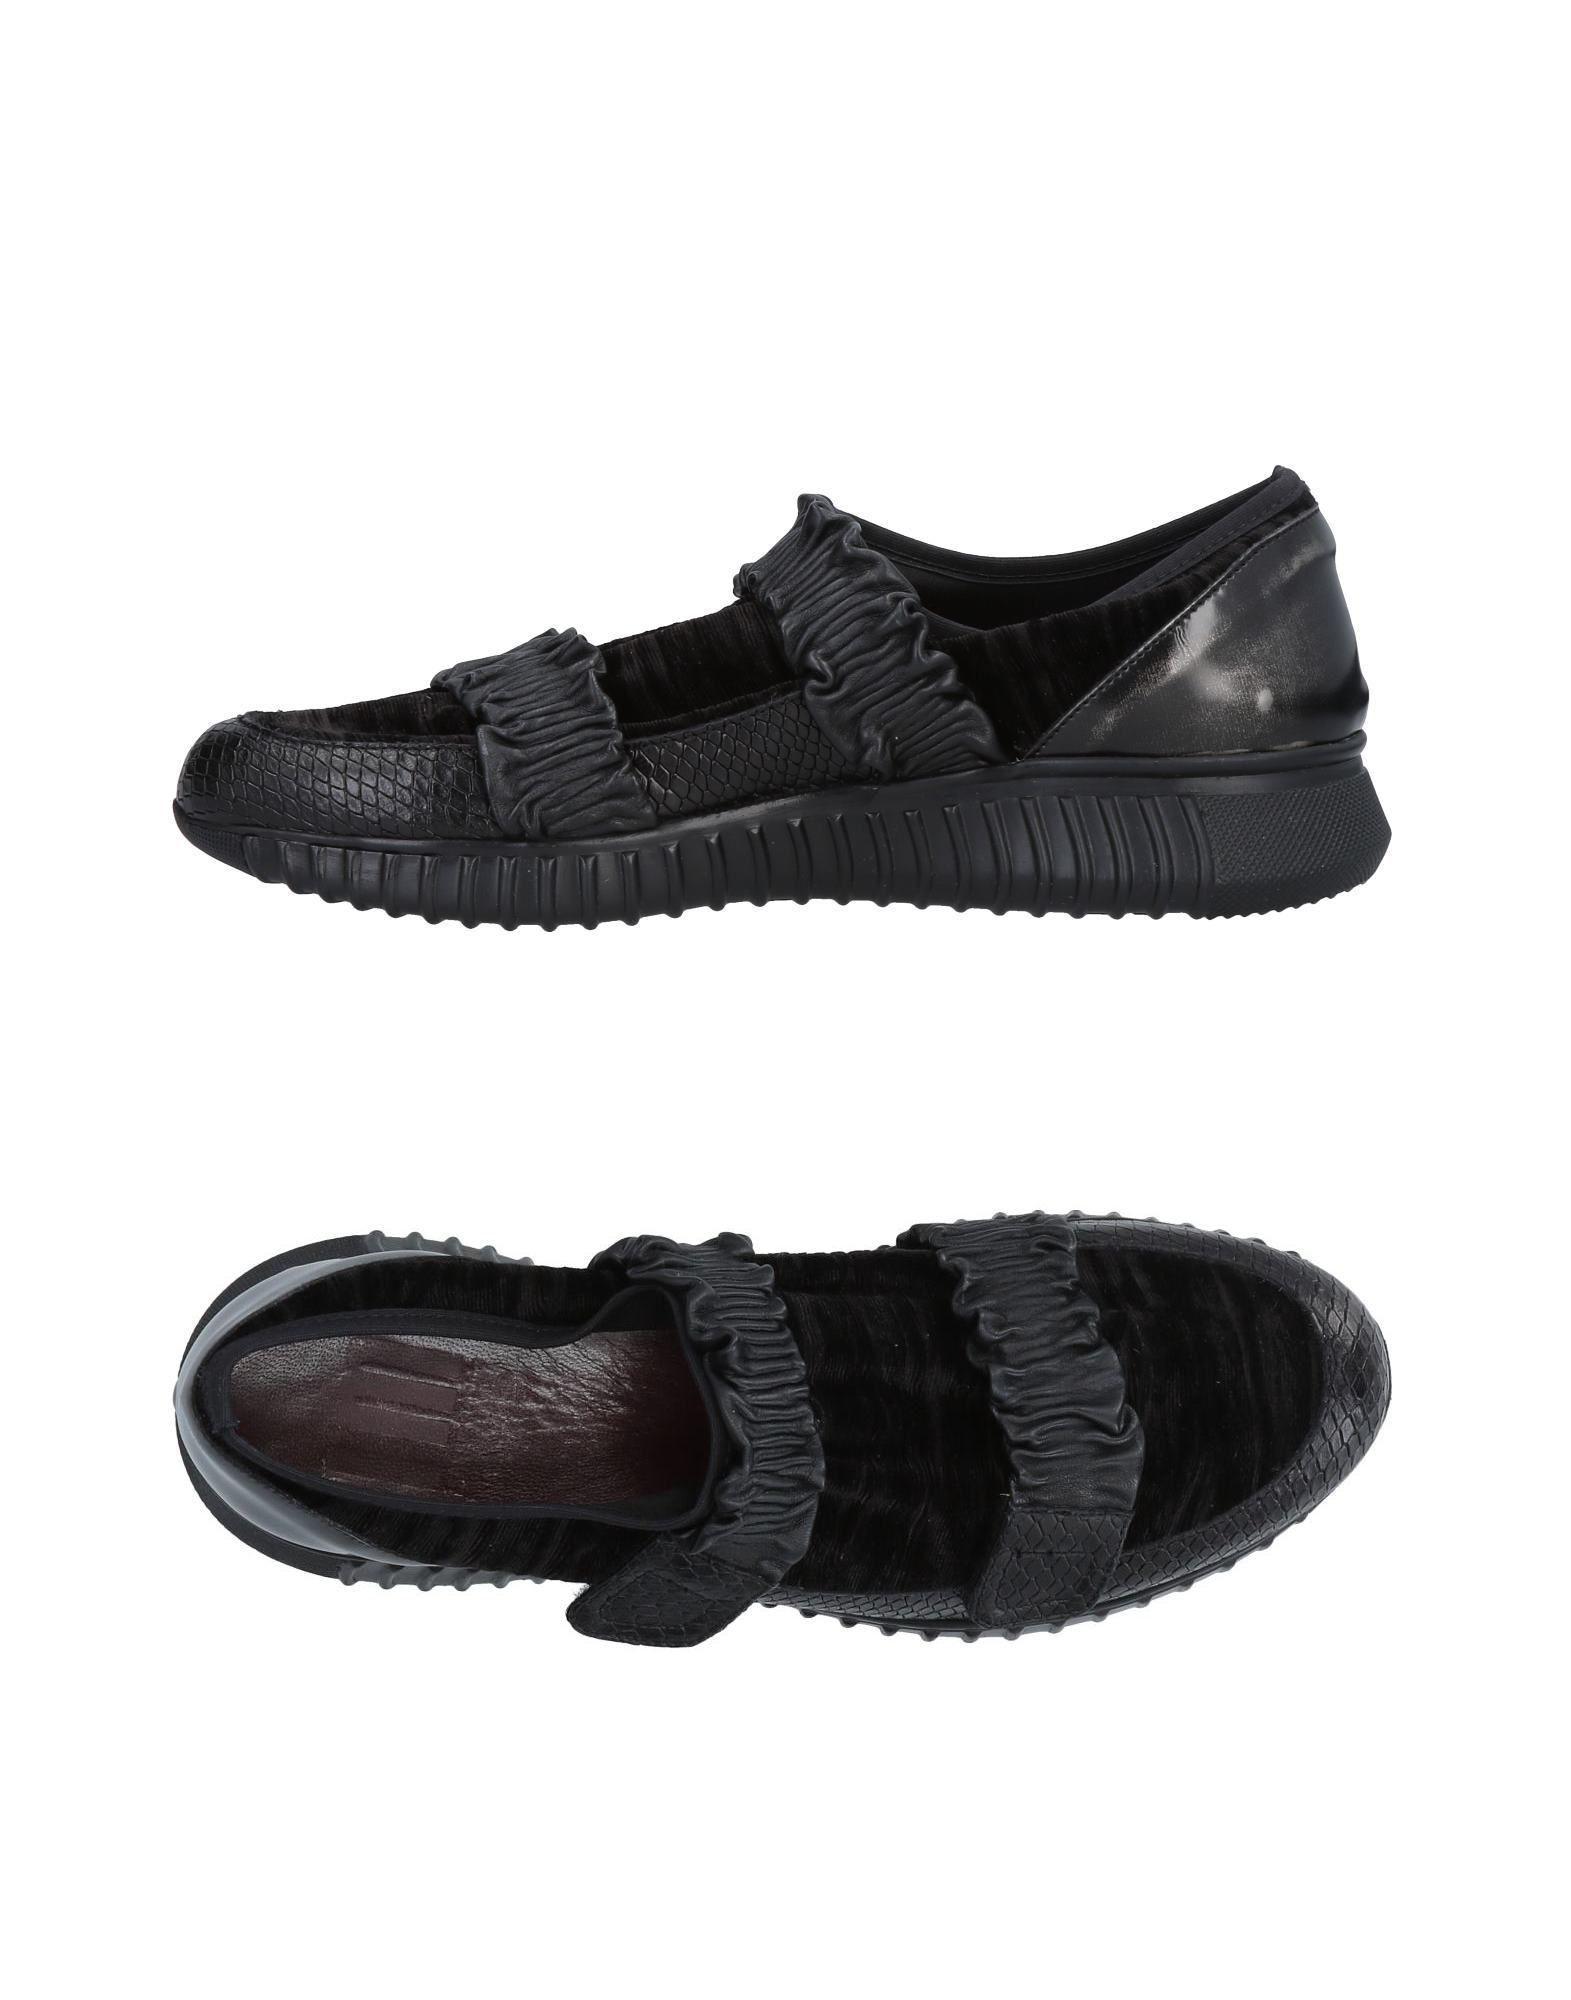 Chaussures - Bas-tops Et Baskets Je Suis Marras Isola LGEod